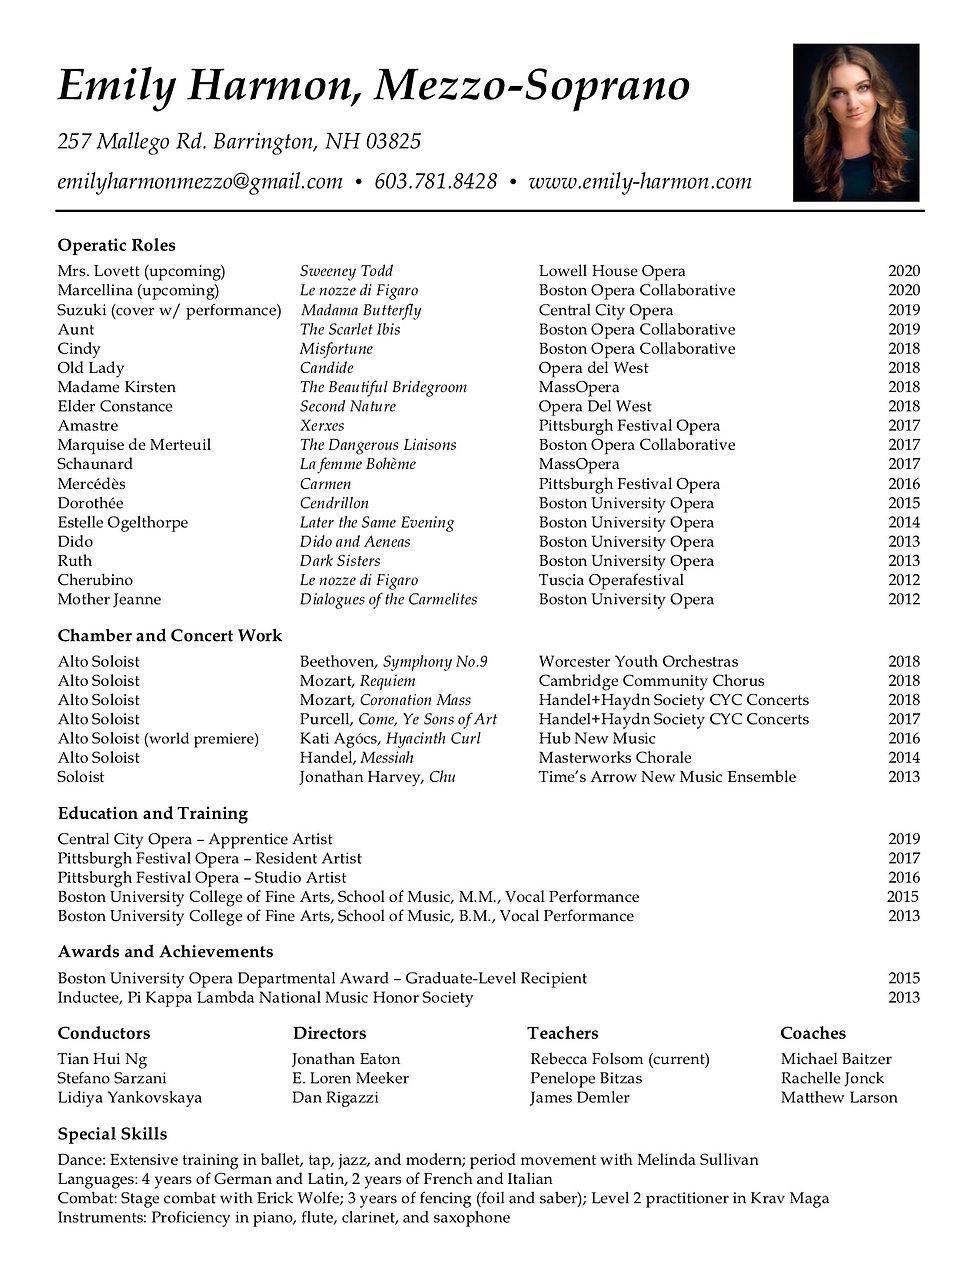 jpg Emily Harmon Vocal Resume ud 11-20-1